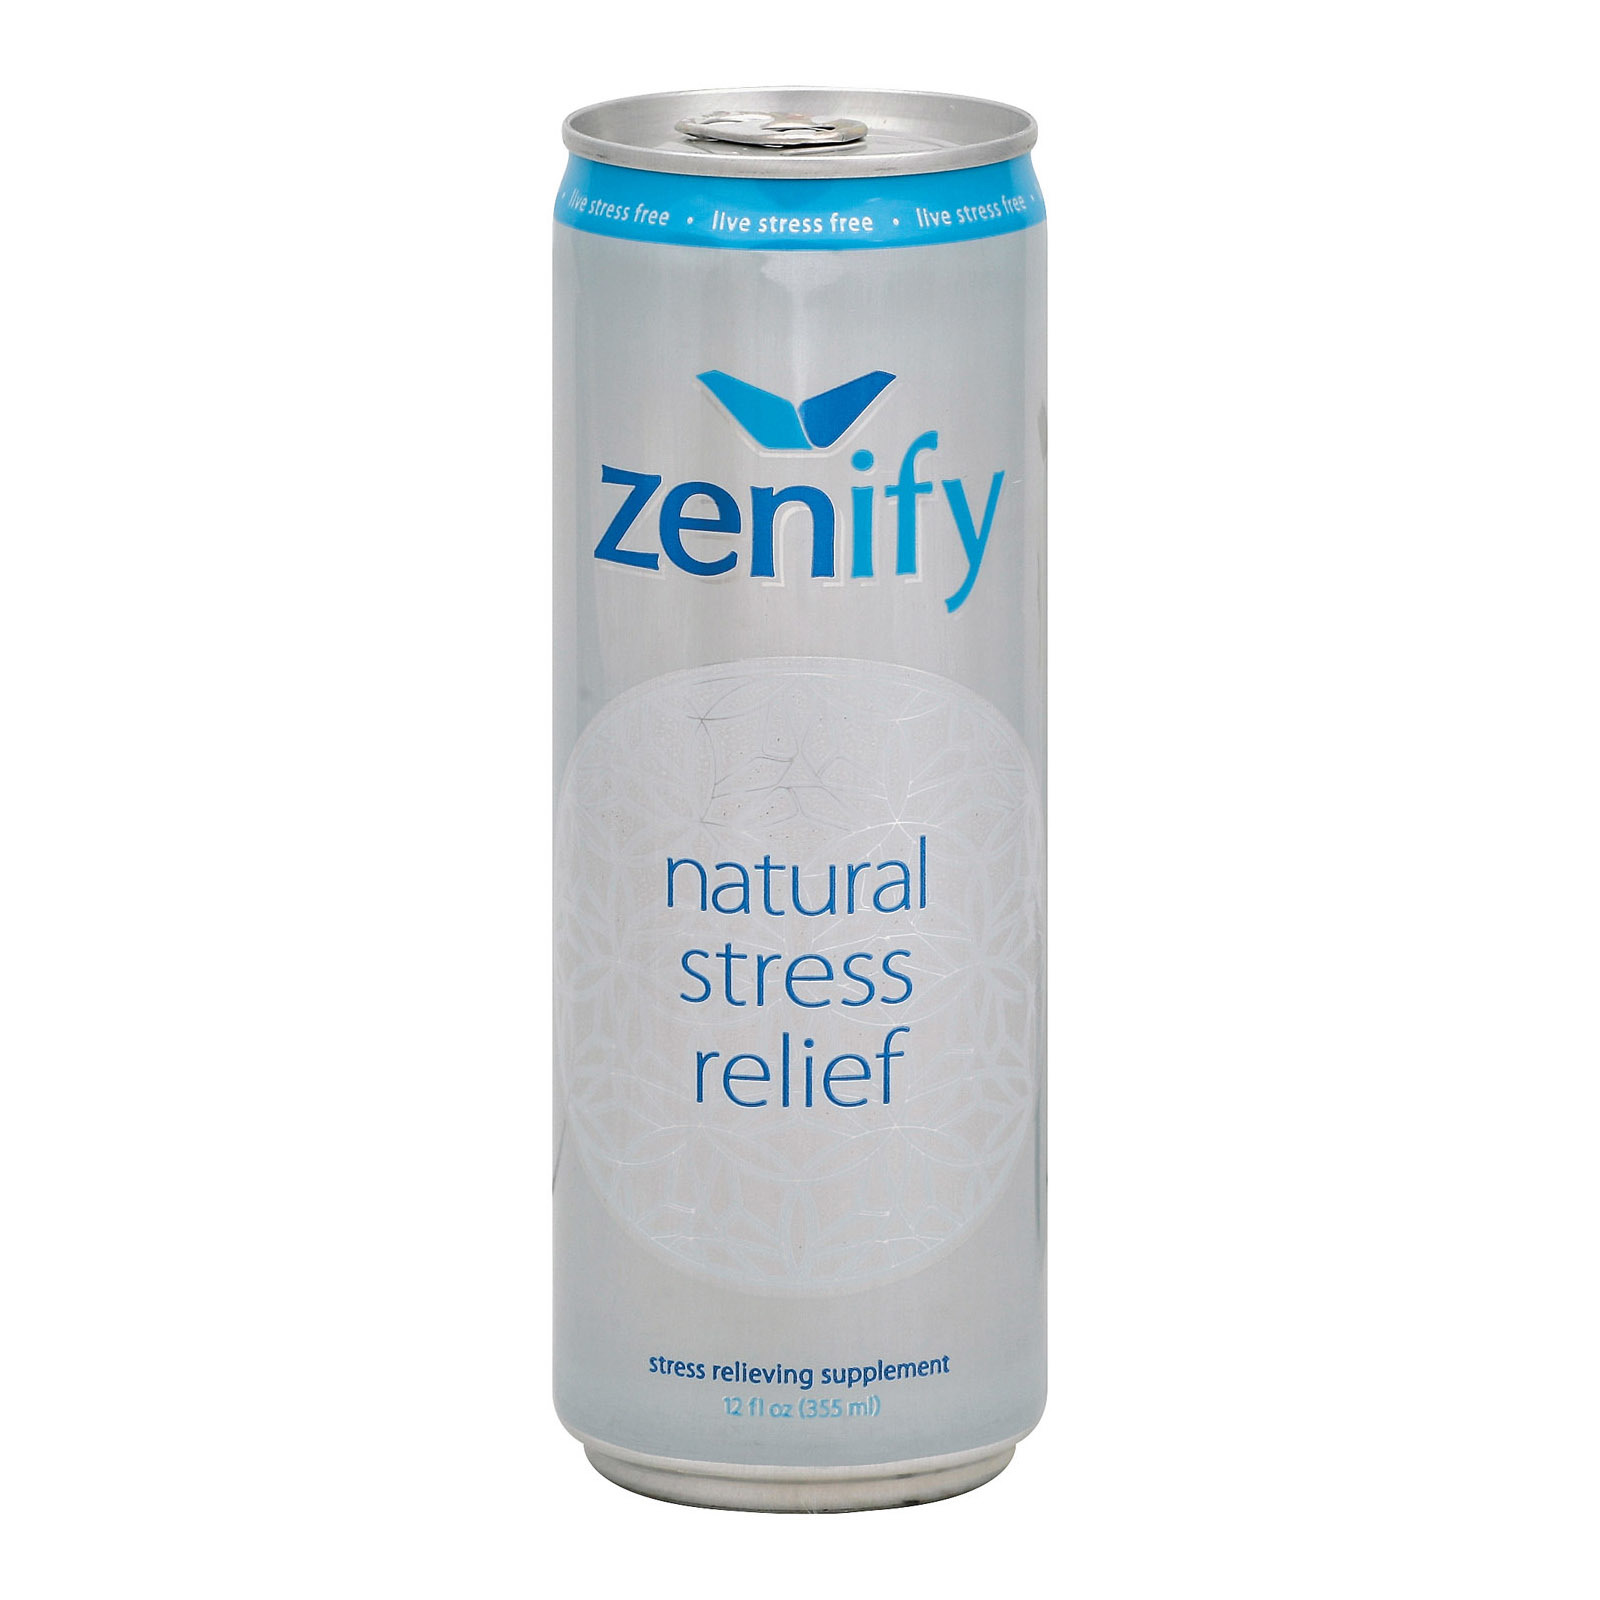 Zenify Stress Relief - Natural - Case of 12 - 12 Fl oz.